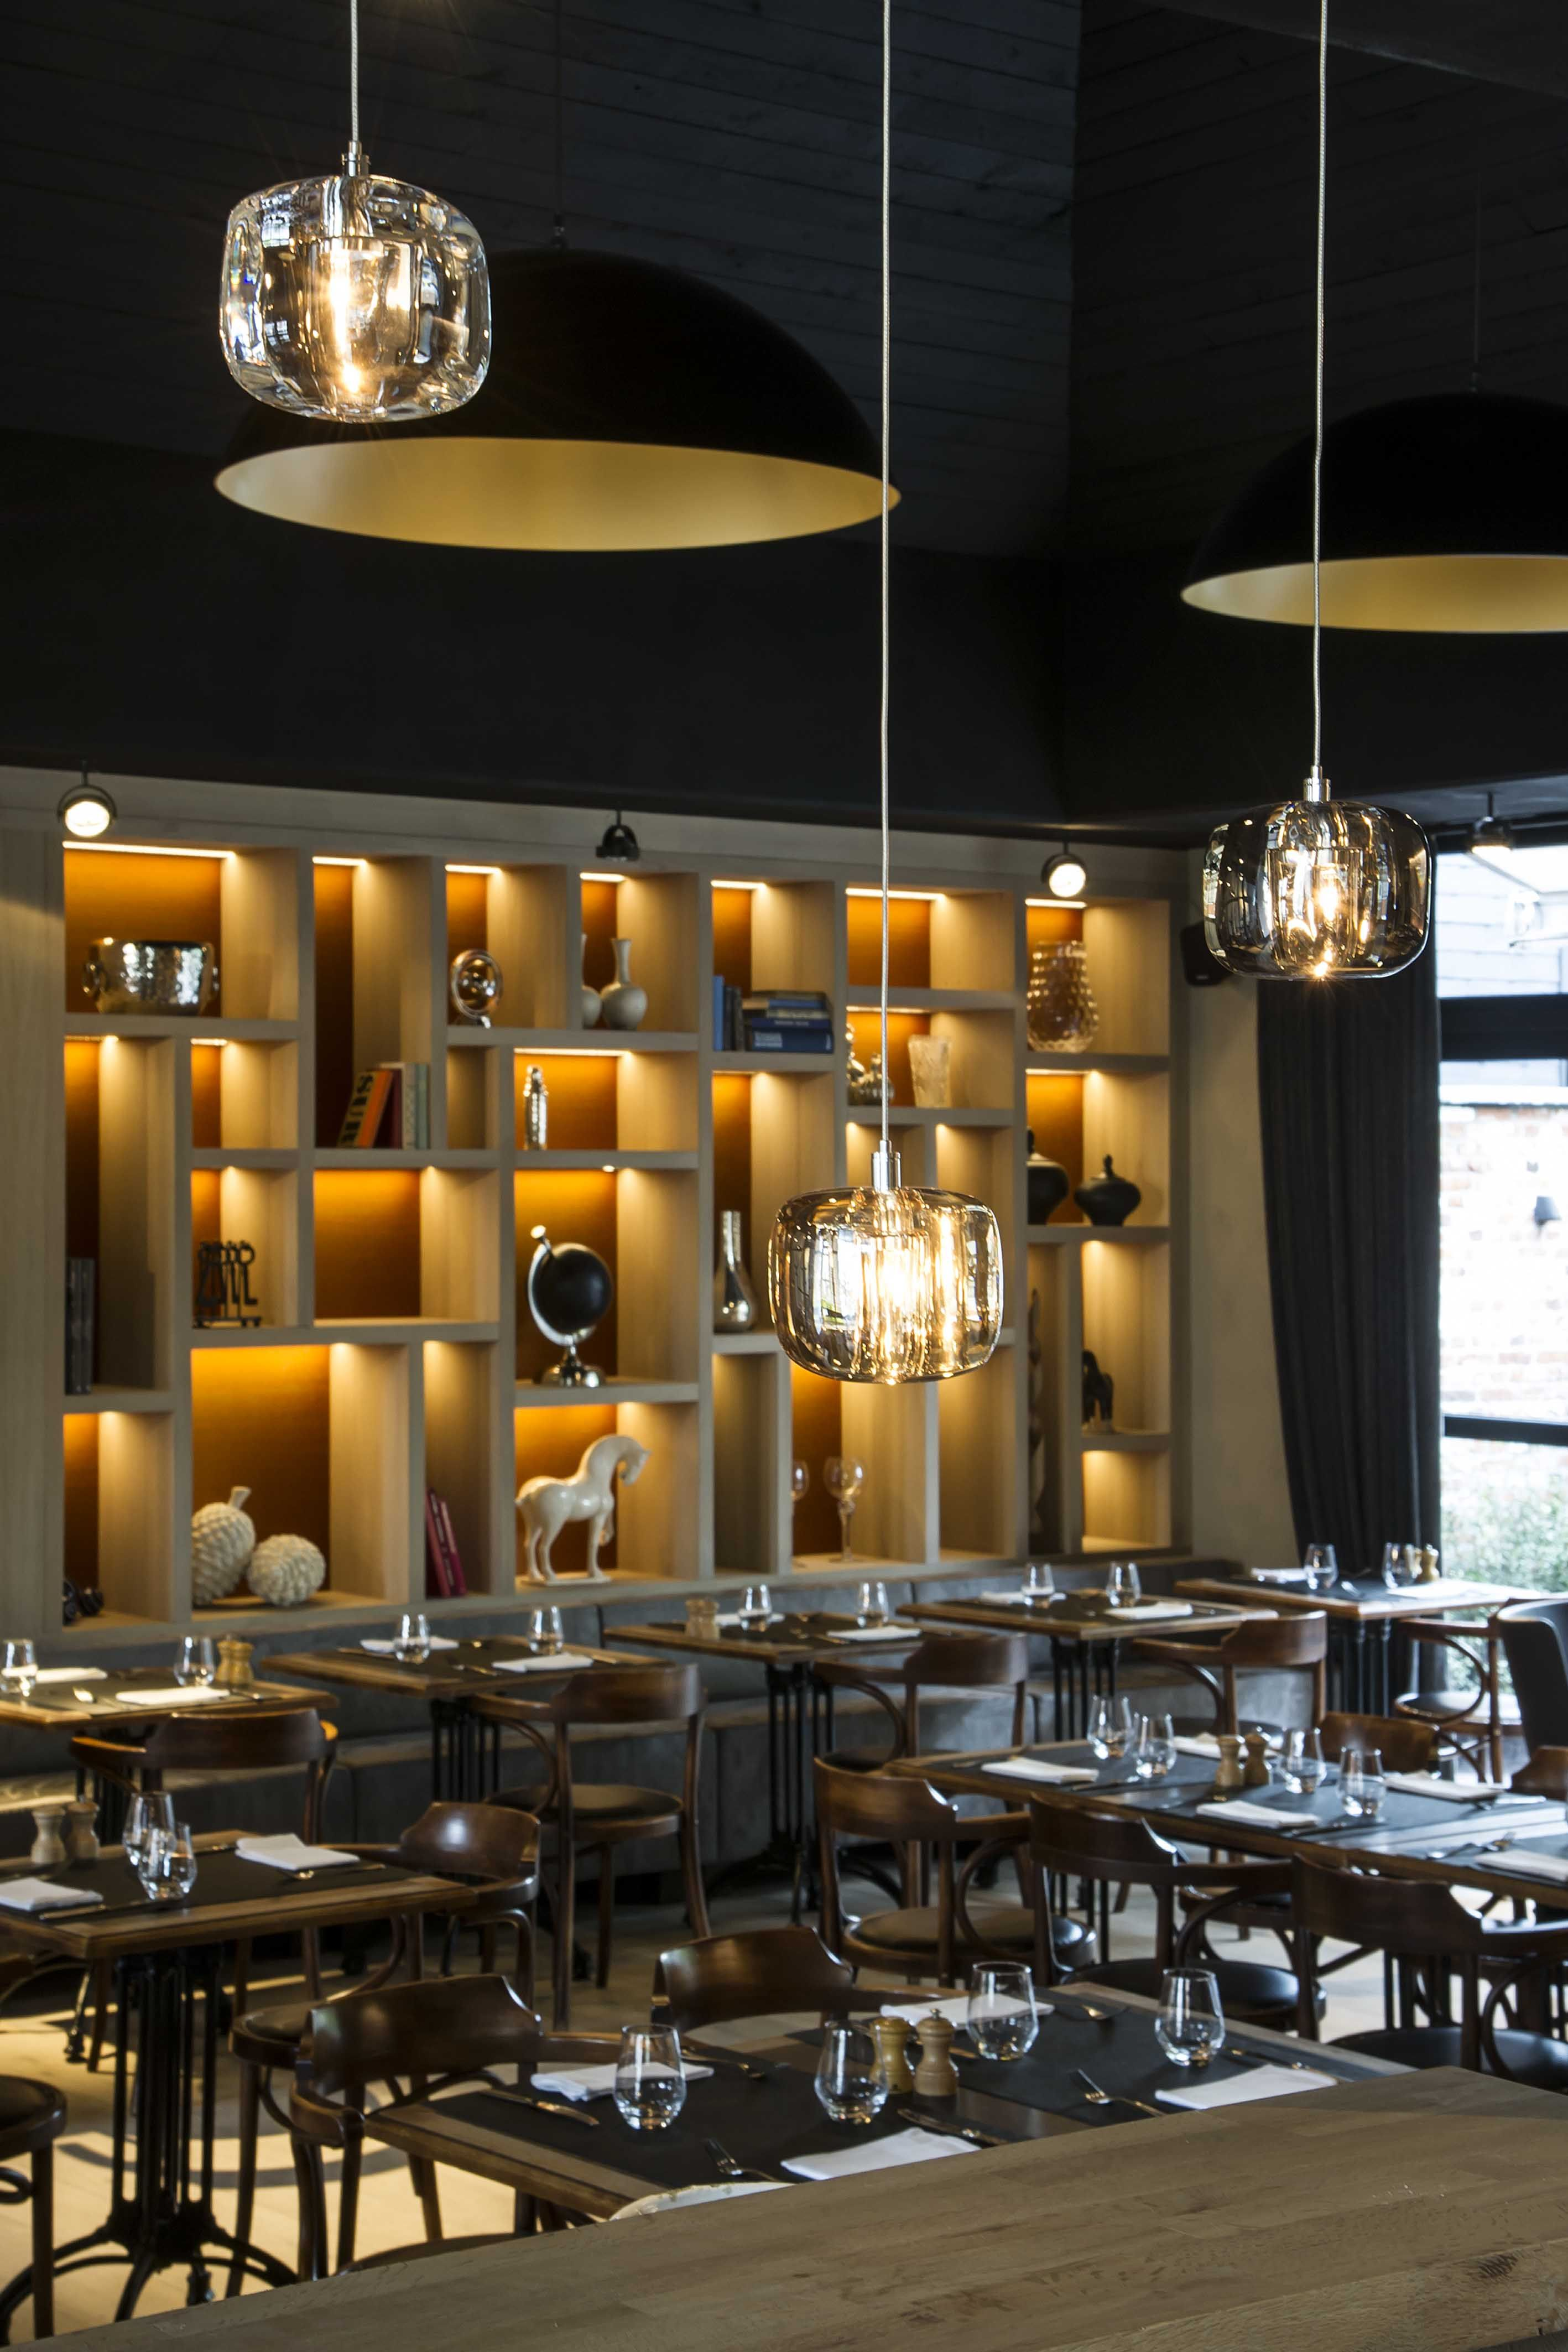 Captivating U0027T KLOOSTER De Pinte WILLE H. Interior Design #restaurant #DARK Lighting #